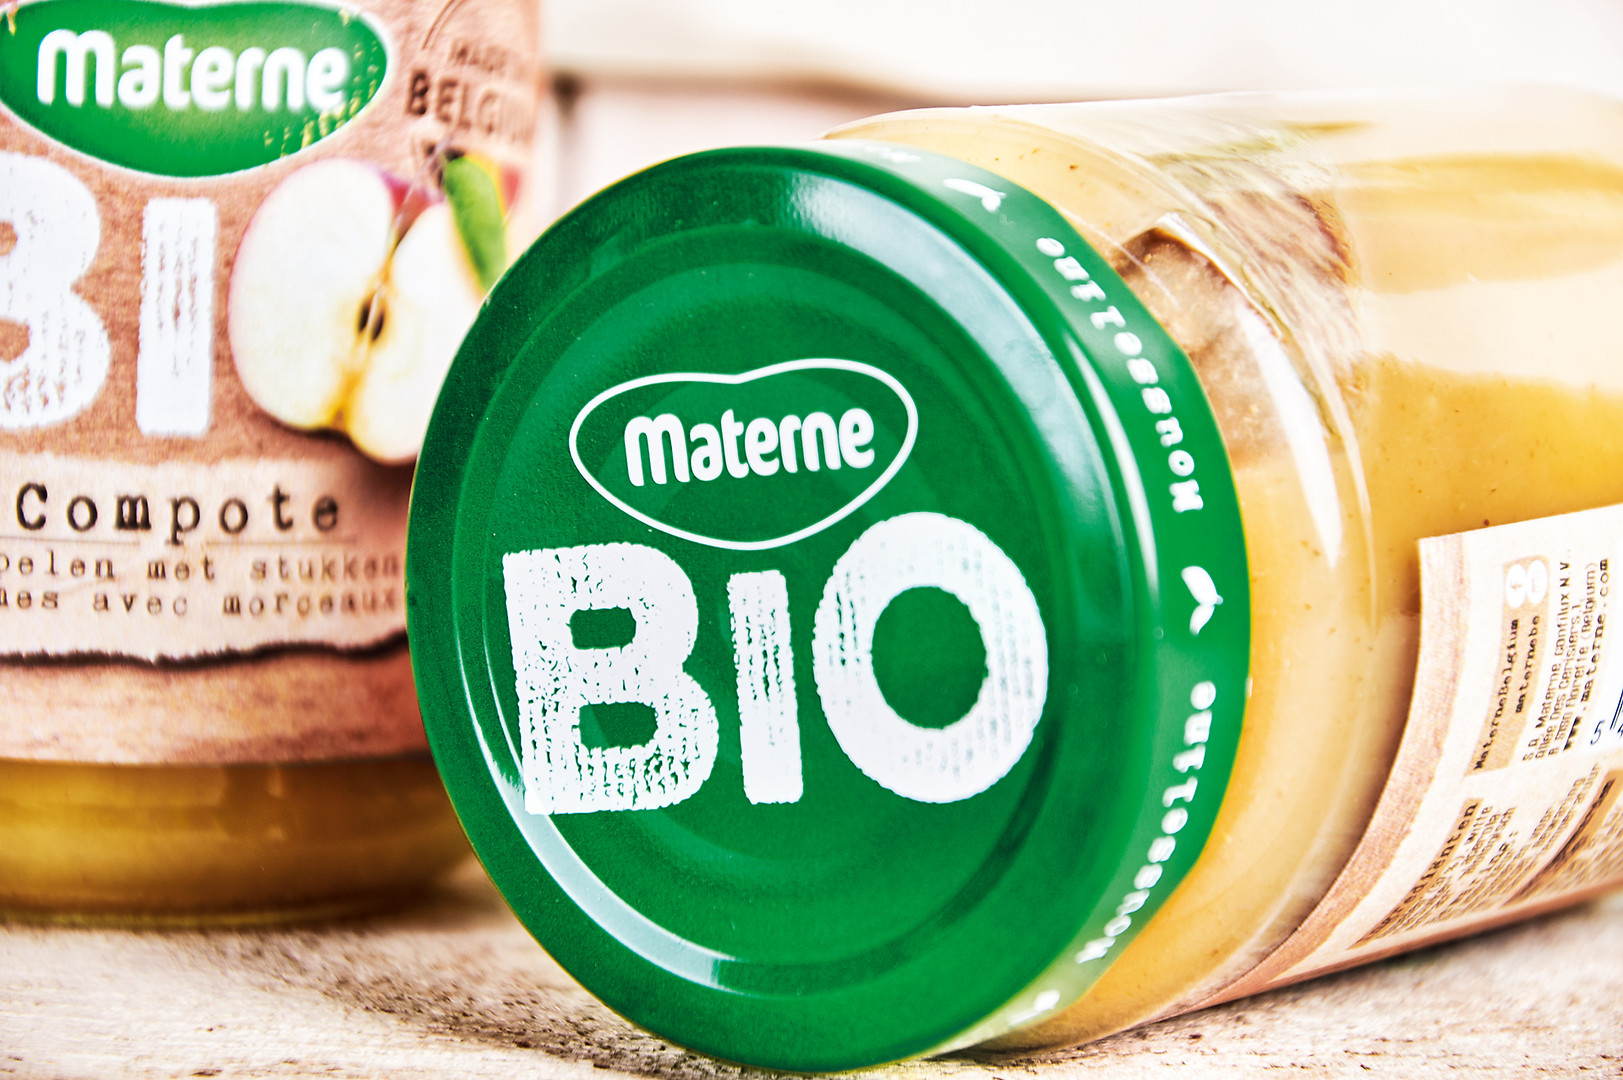 Materne---Bio---Close-up-Deksel.jpg